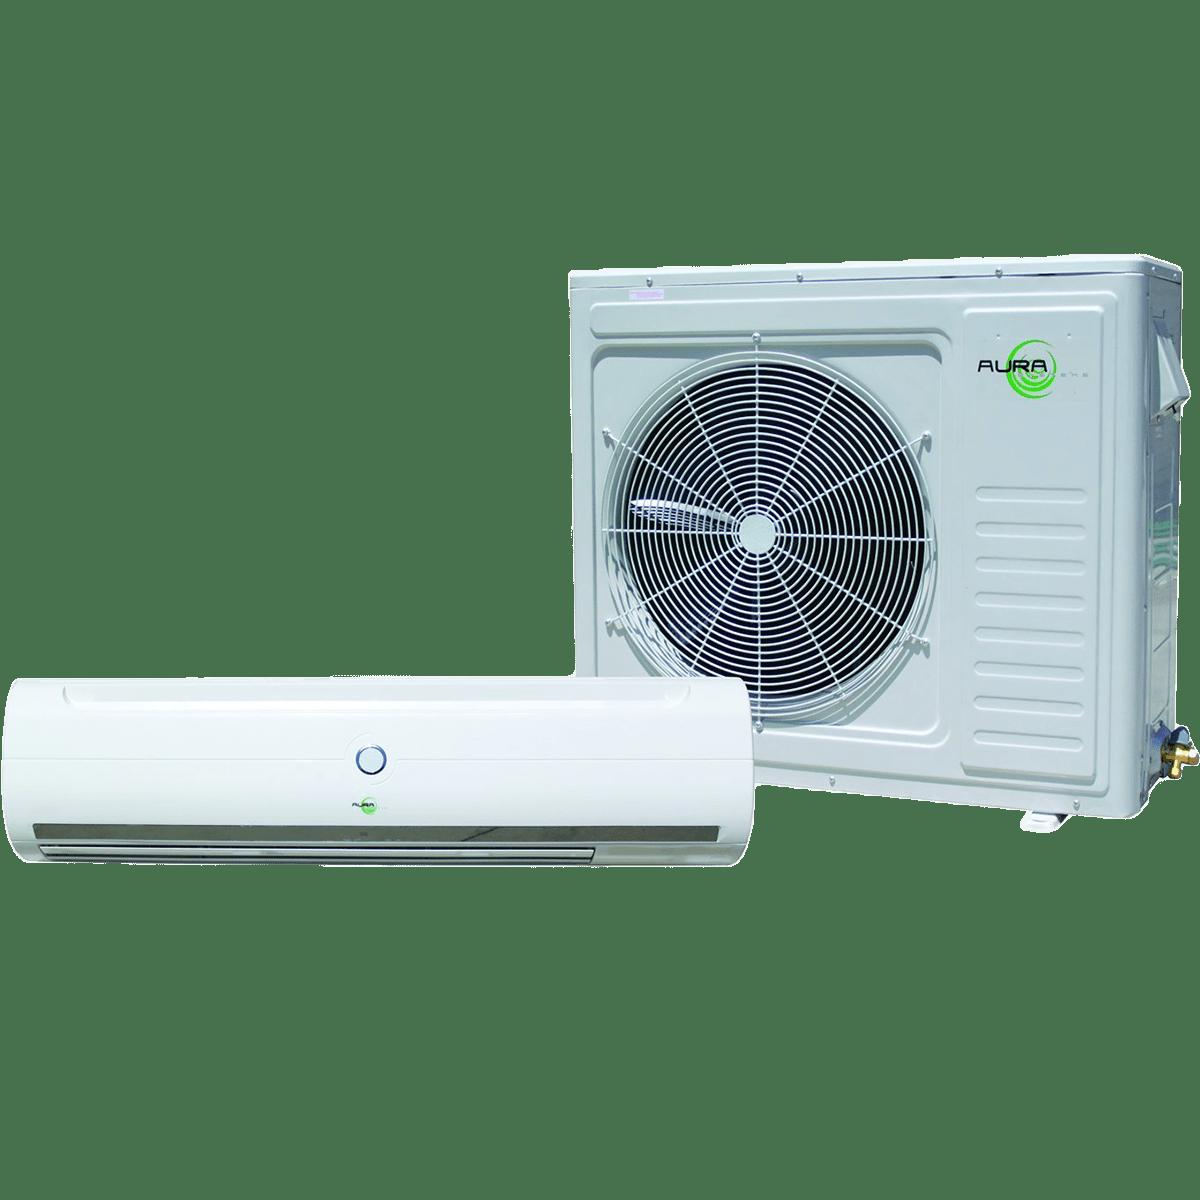 Aura Systems 36,000 Btu Diy Quick Connect Mini Split W/ Heat